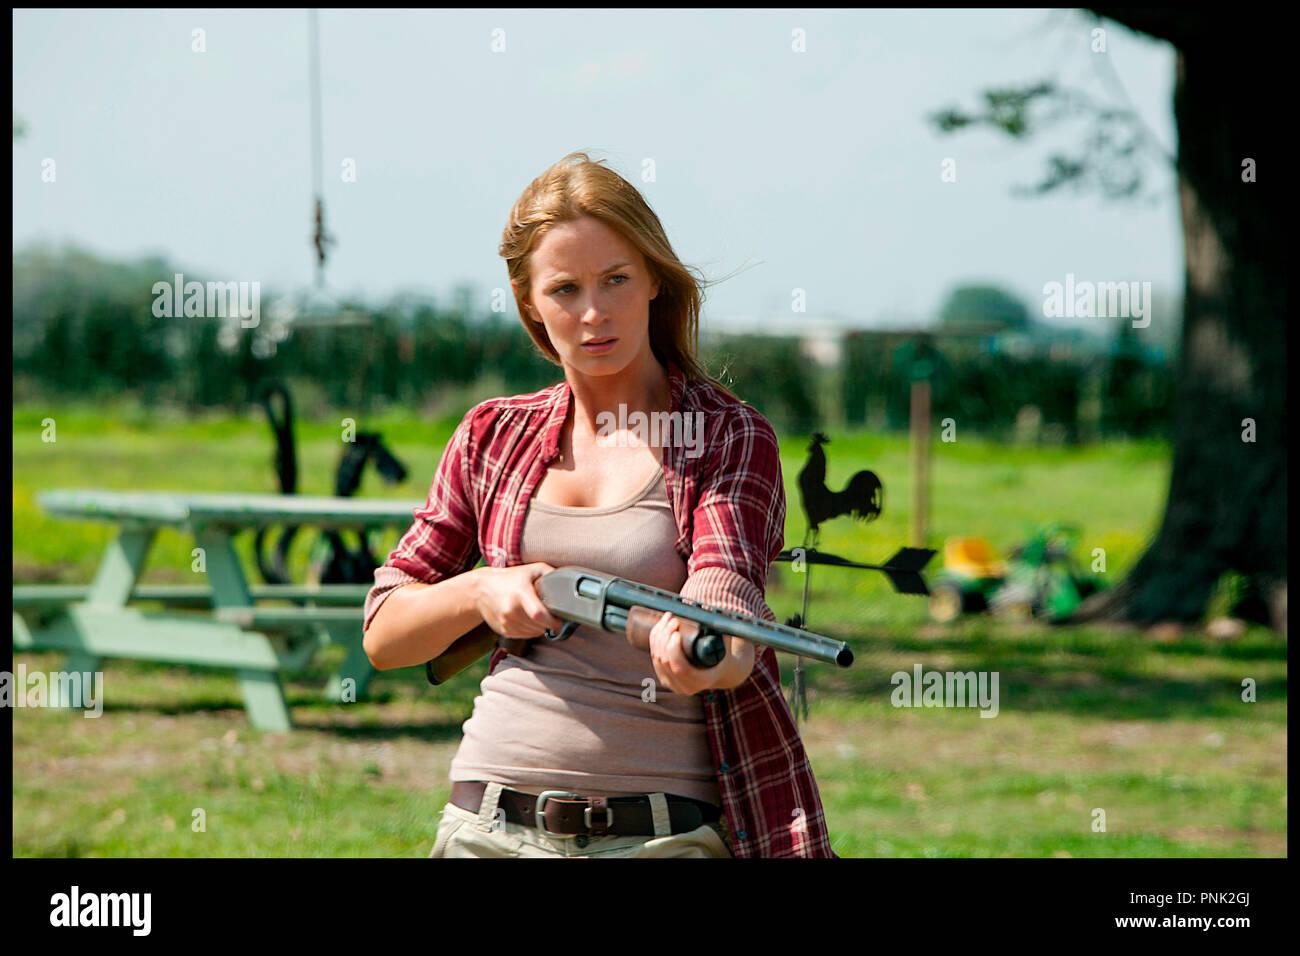 Prod DB © DMG Entertainment - Endgame Entertainment - FilmDistrict / DR LOOPER de Rian Johnson 2012 USA avec Emily Blunt - Stock Image